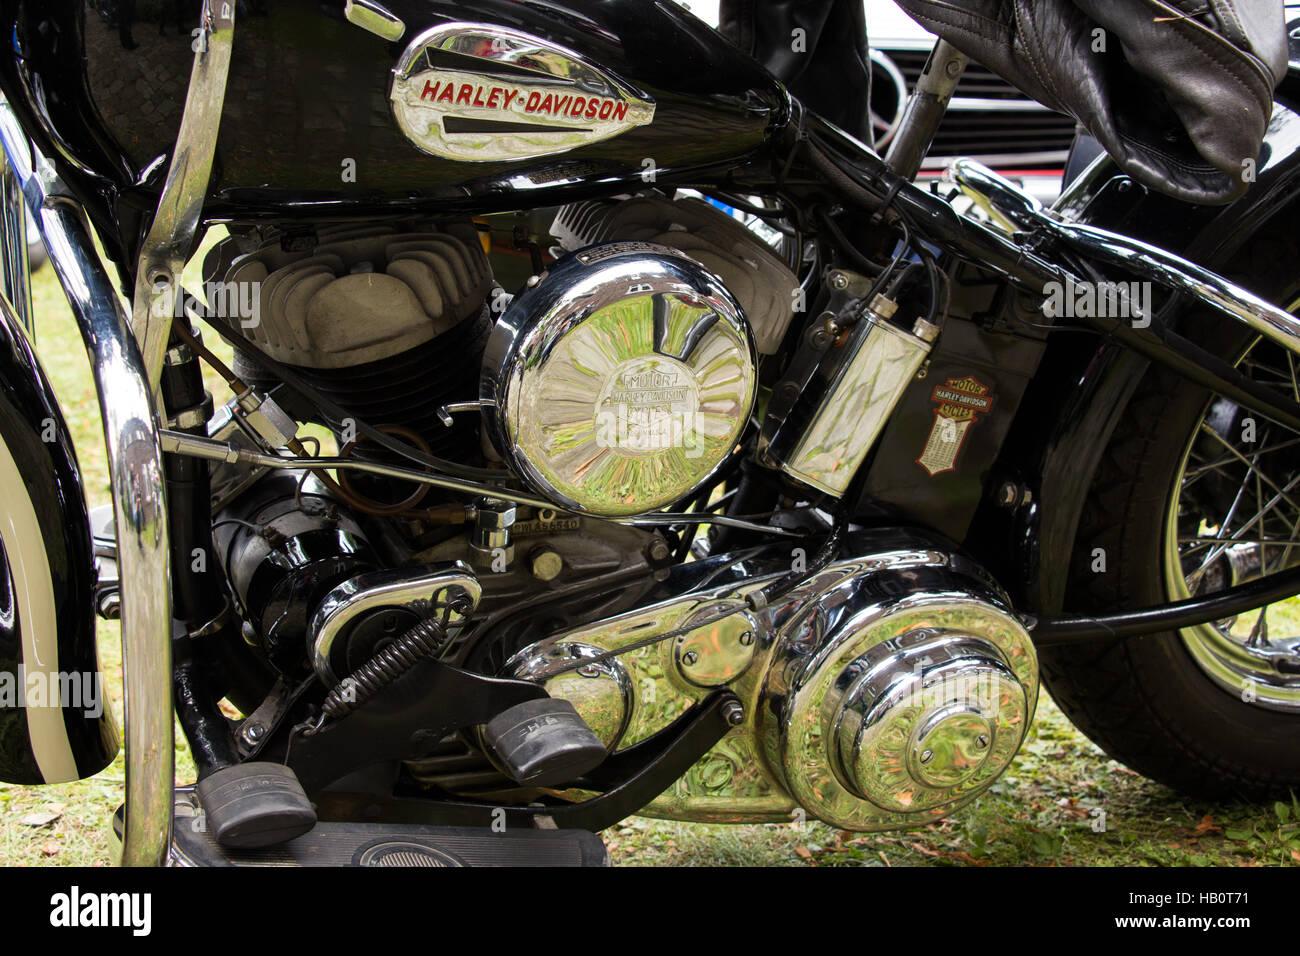 Harley Davidson Oldtimer - Stock Image